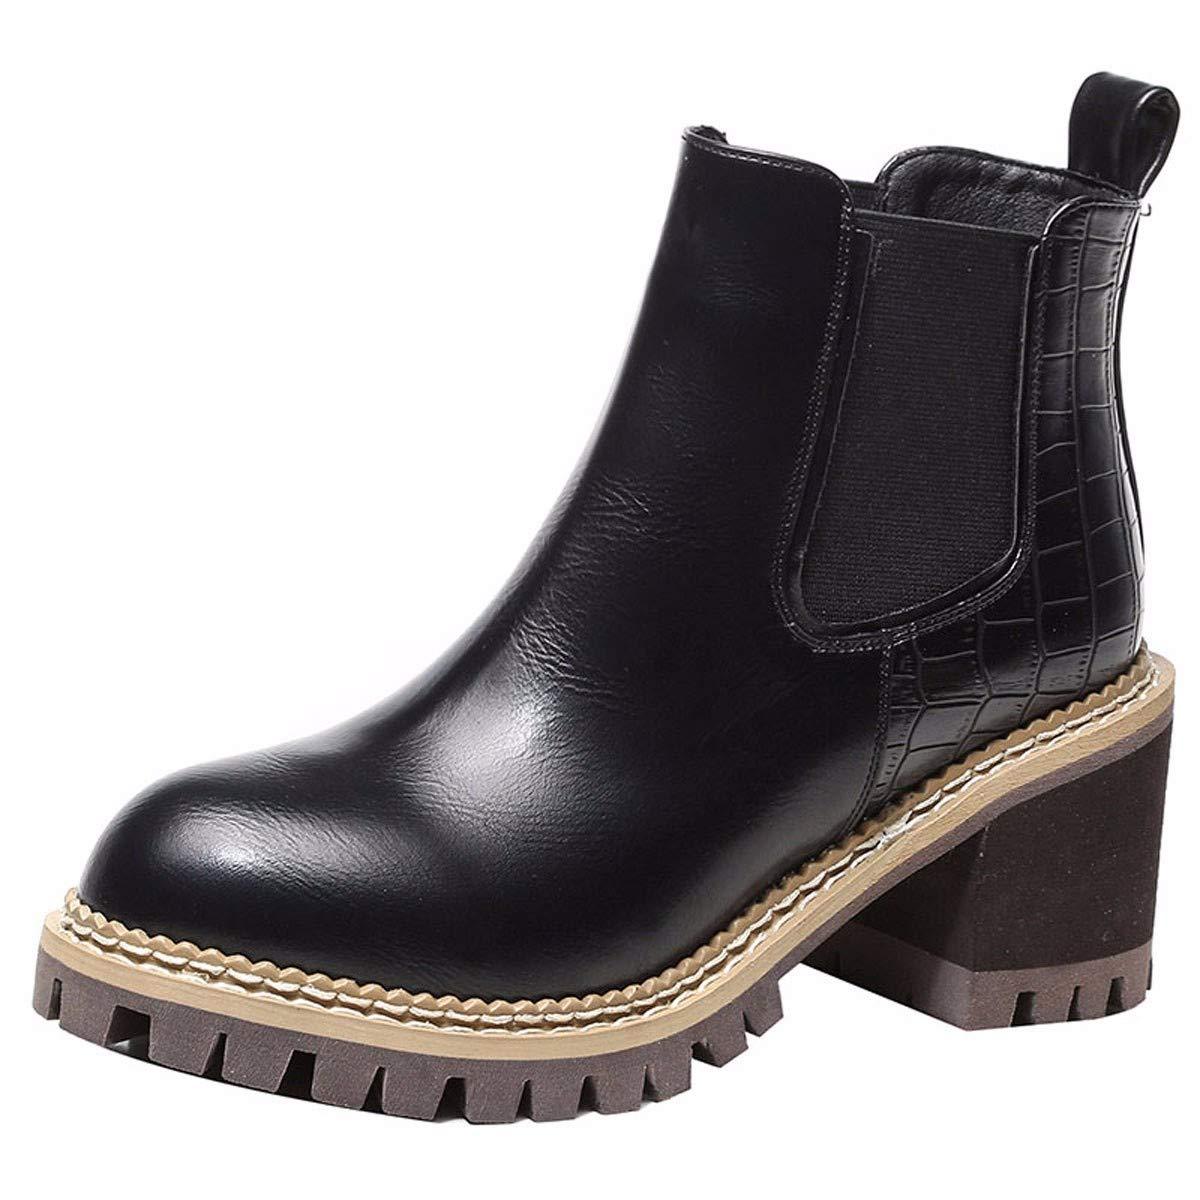 HBDLH Damenschuhe/Kurze Stiefel High - 8Cm Wild Und Rau Samt Ma Dingxue.